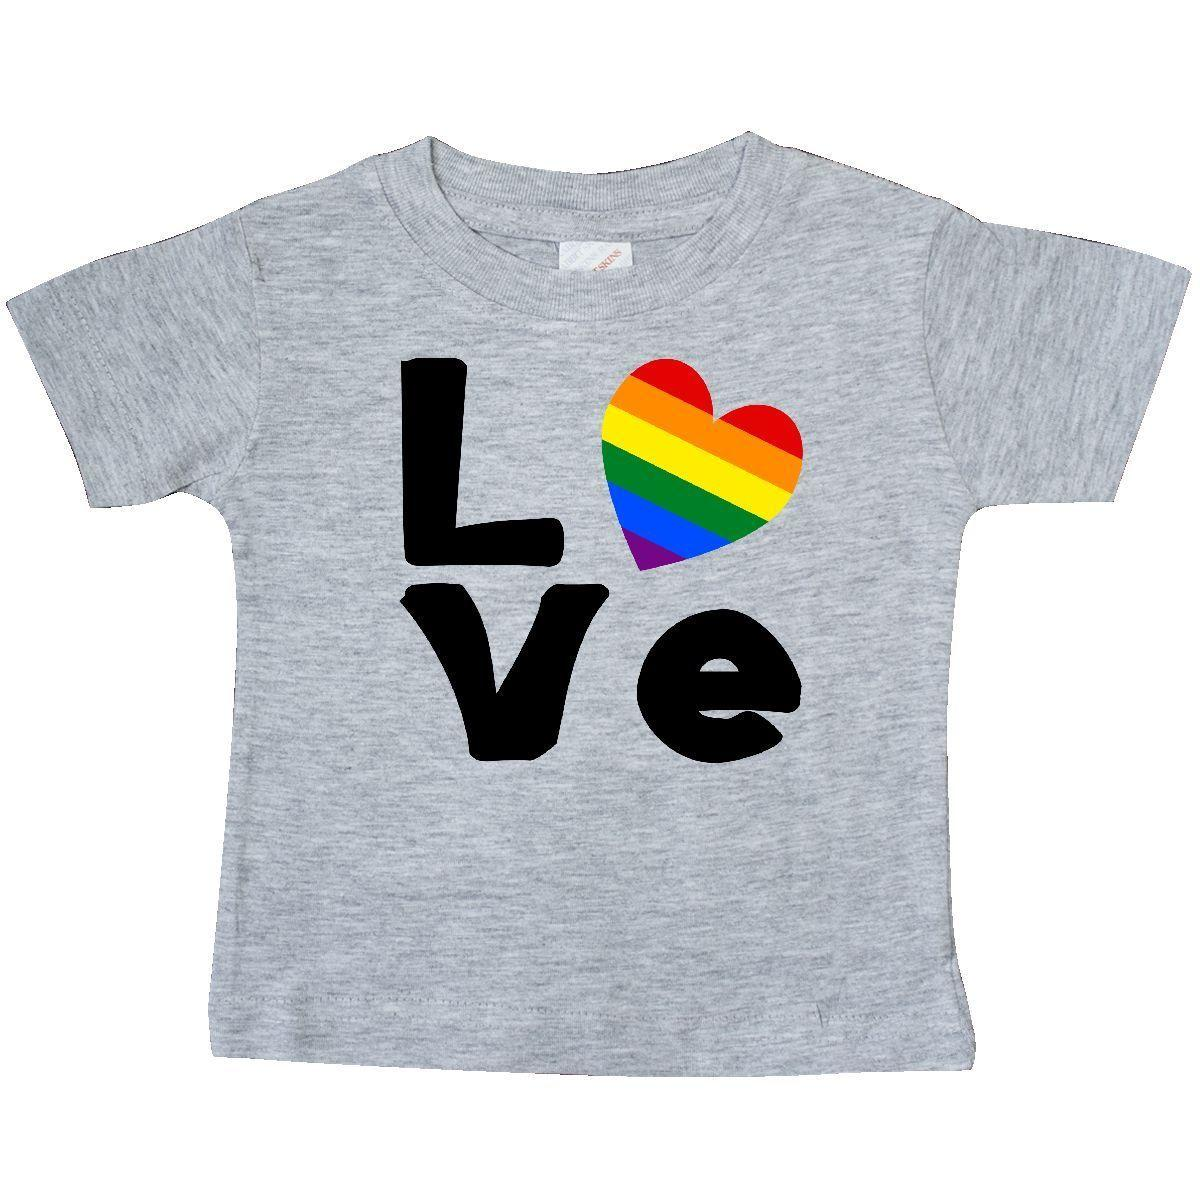 Inktastic Gay Love Black Baby T Shirt Pride Rainbow Flag Heart Lgbt T Shirt Tees Funny Free Shipping Unisex Casual Tee Gift